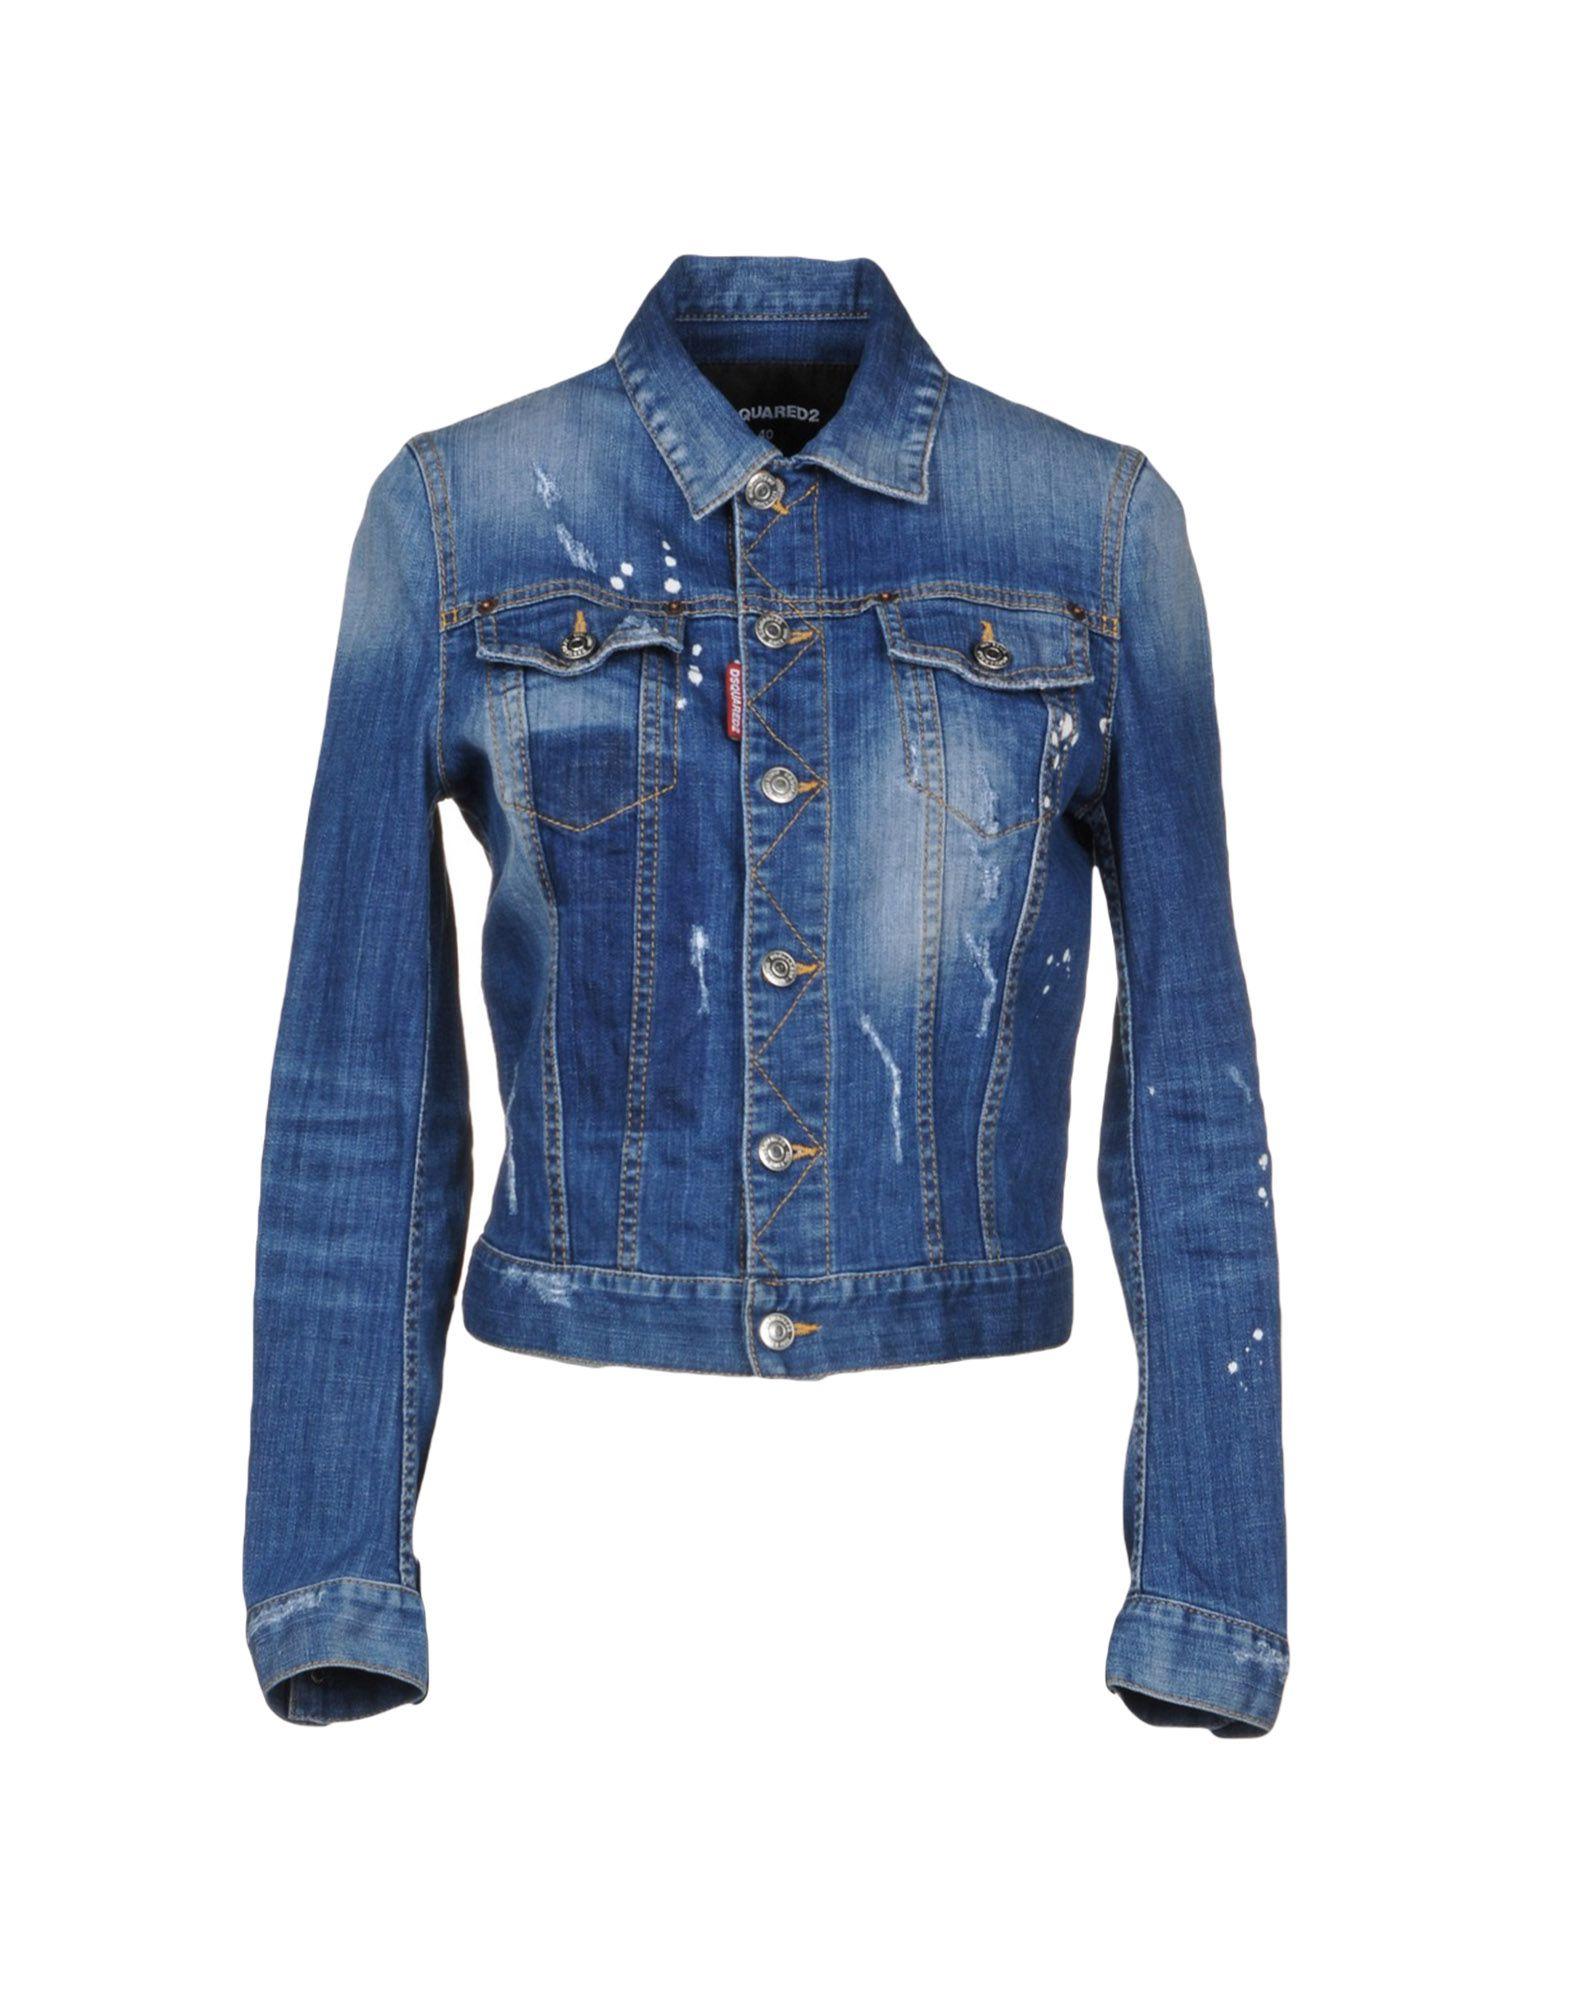 Giubbotto Jeans Dsquared2 Donna - Acquista online su Ws5W63k2kc